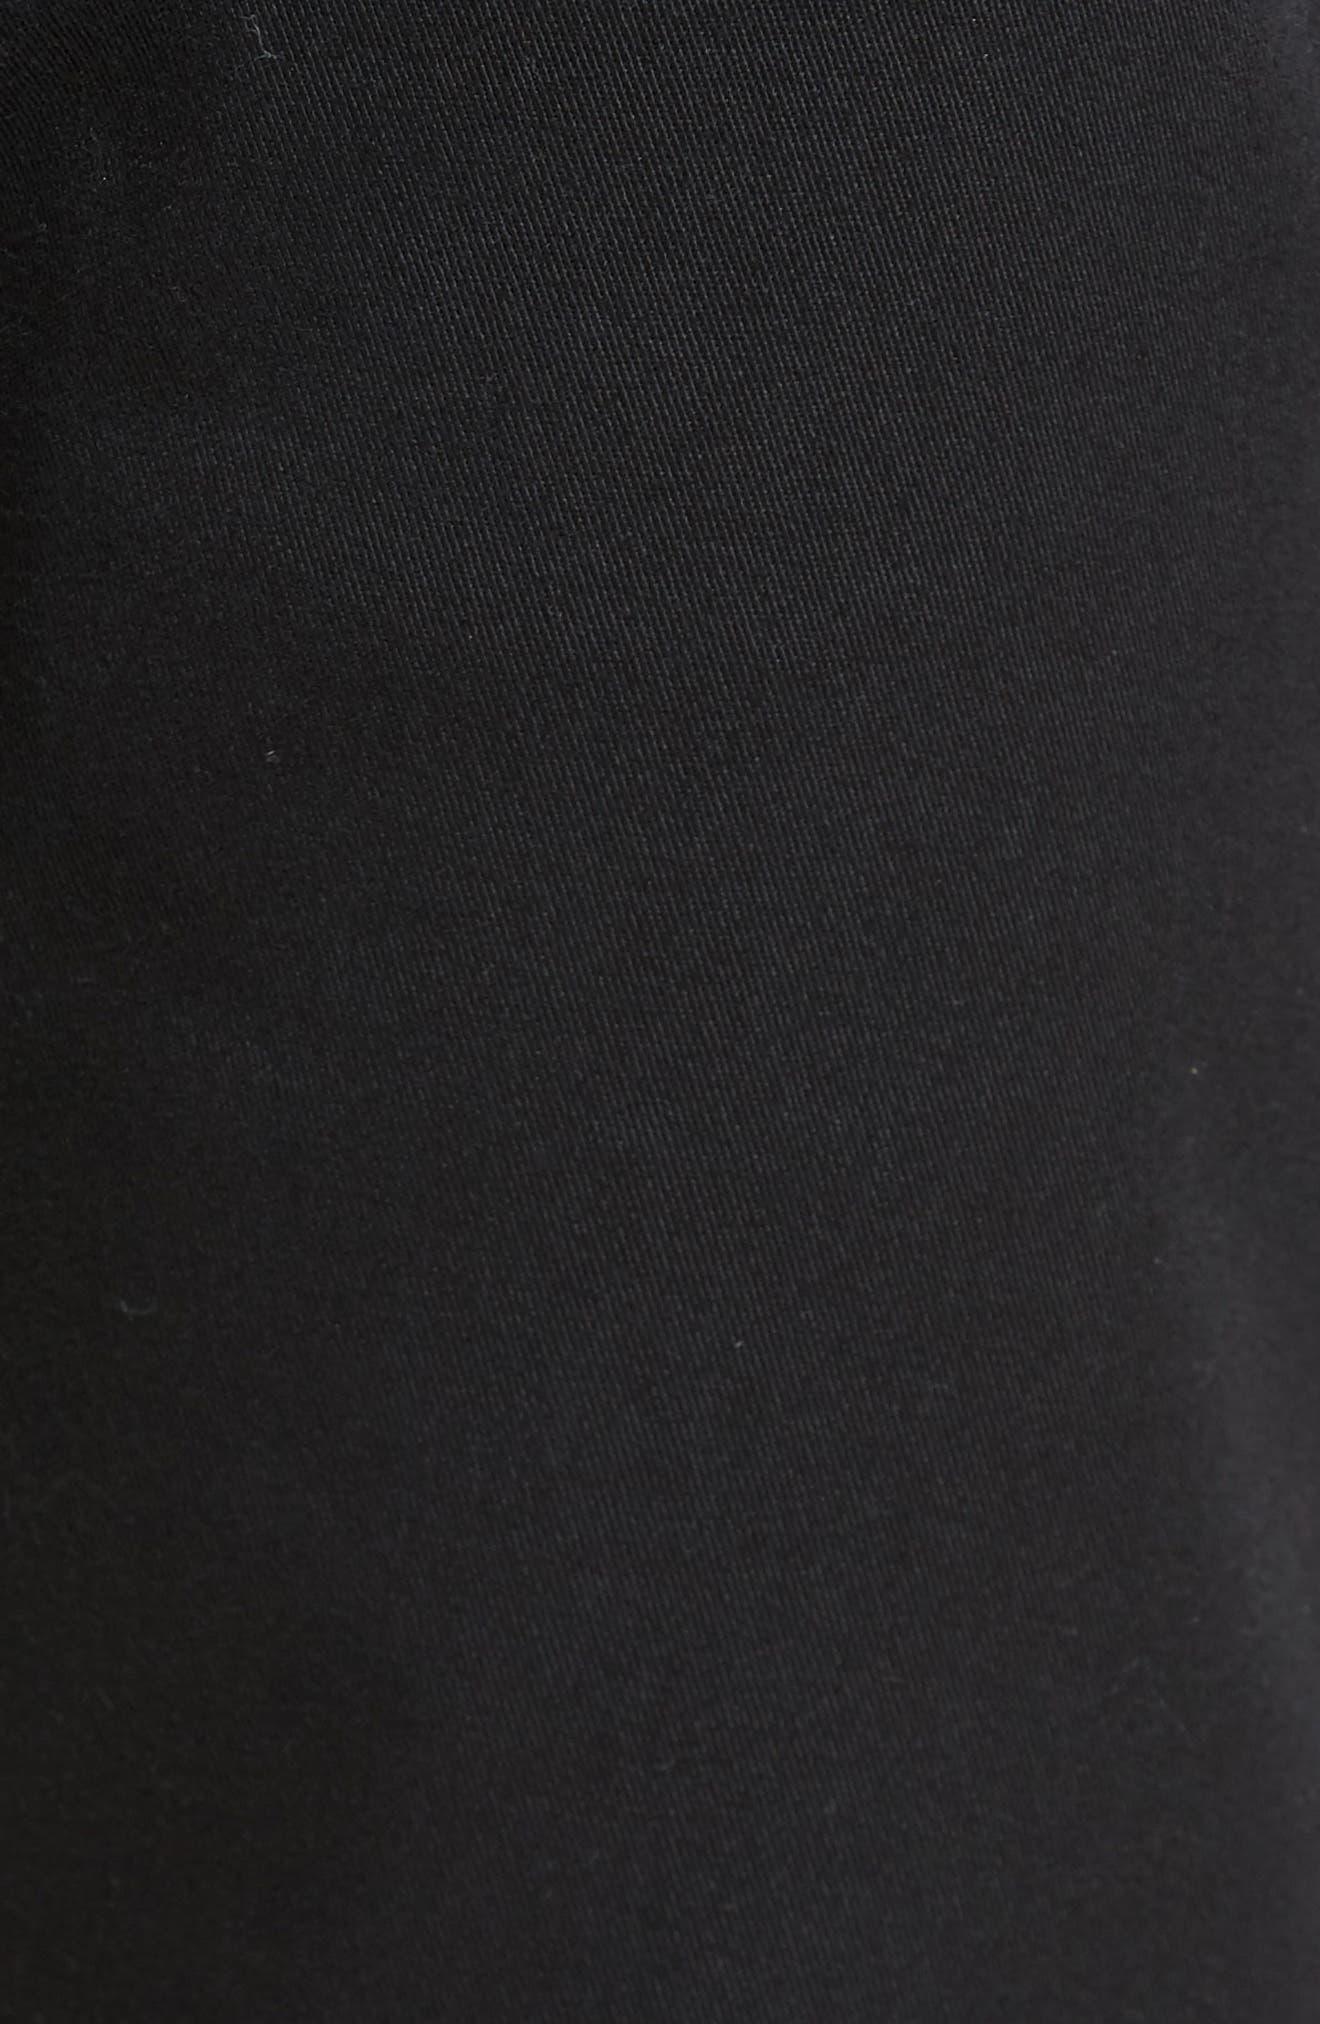 V56 Covina II Slim Fit Pants,                             Alternate thumbnail 16, color,